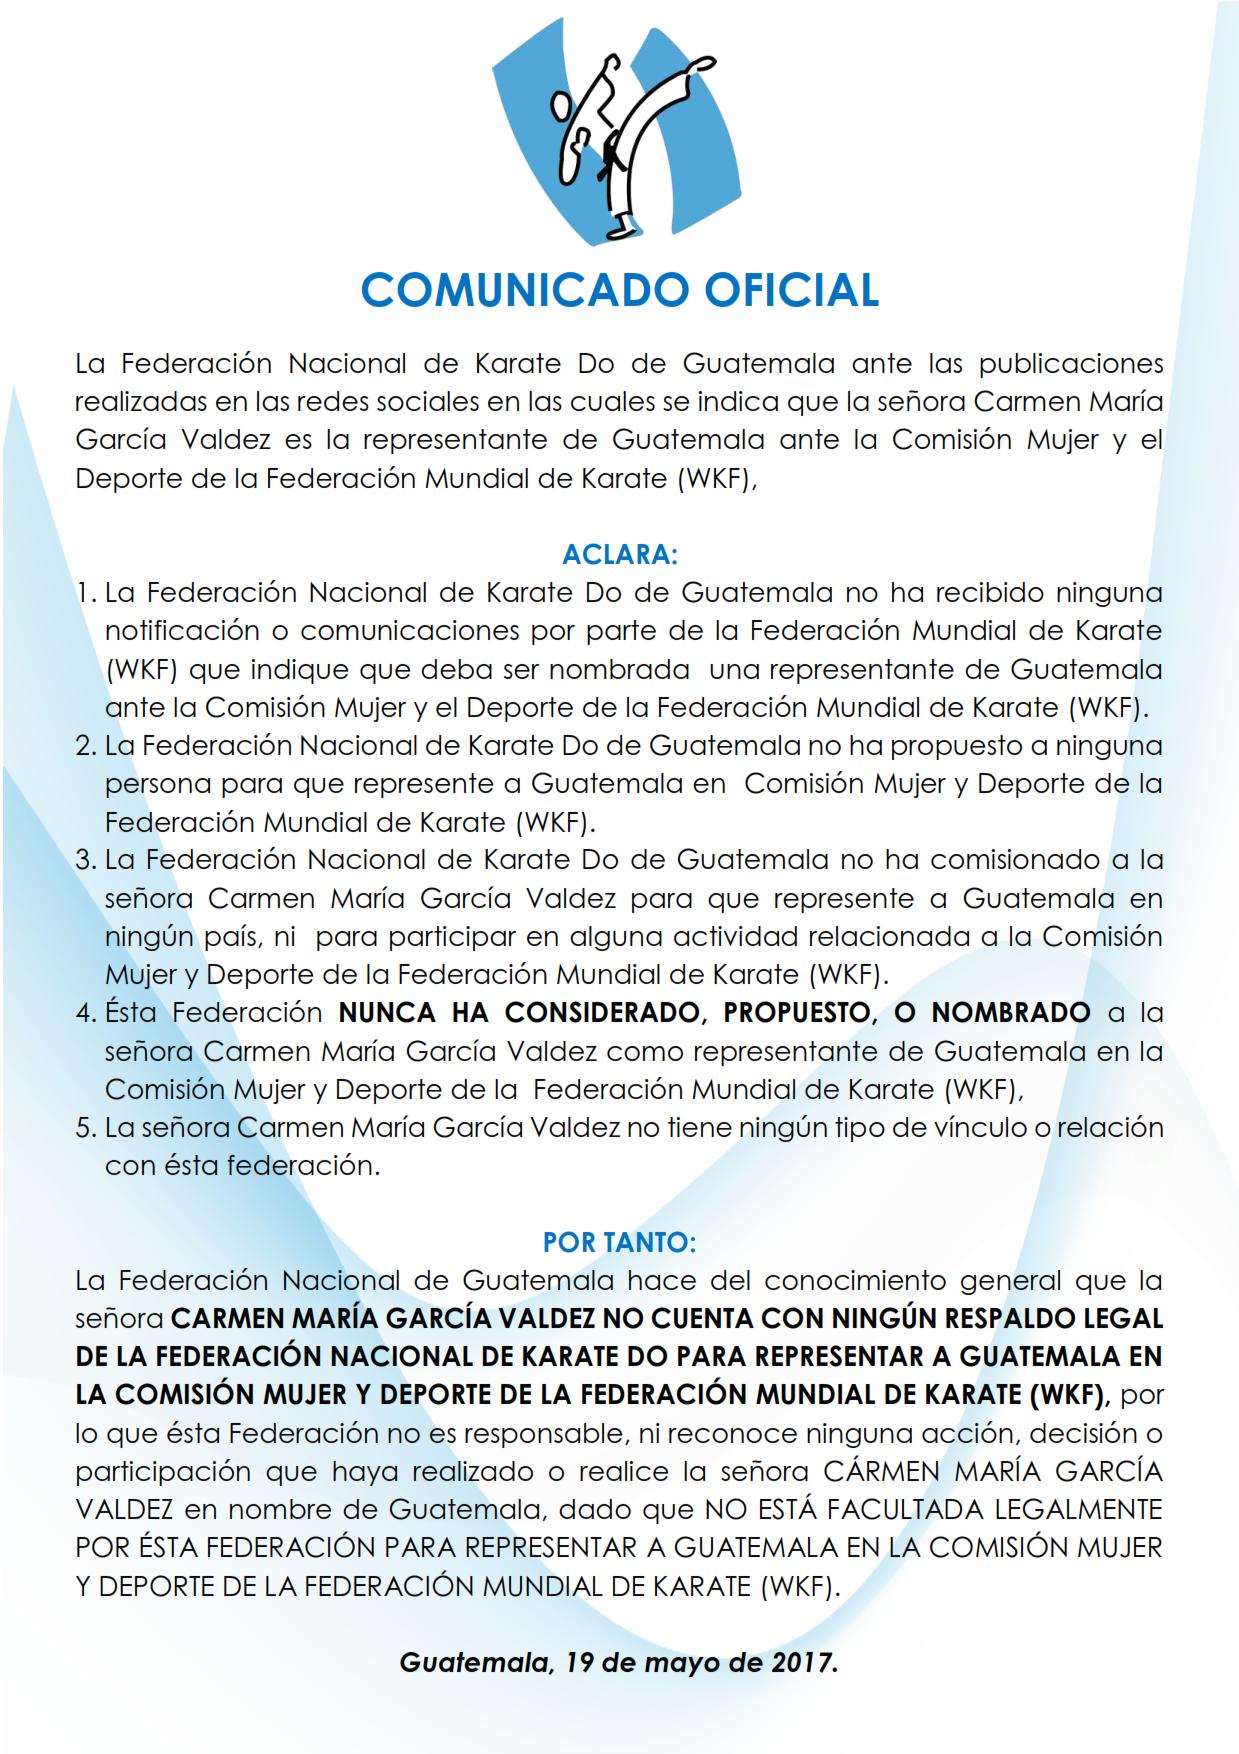 COMUNICADO OFICIAL1 001